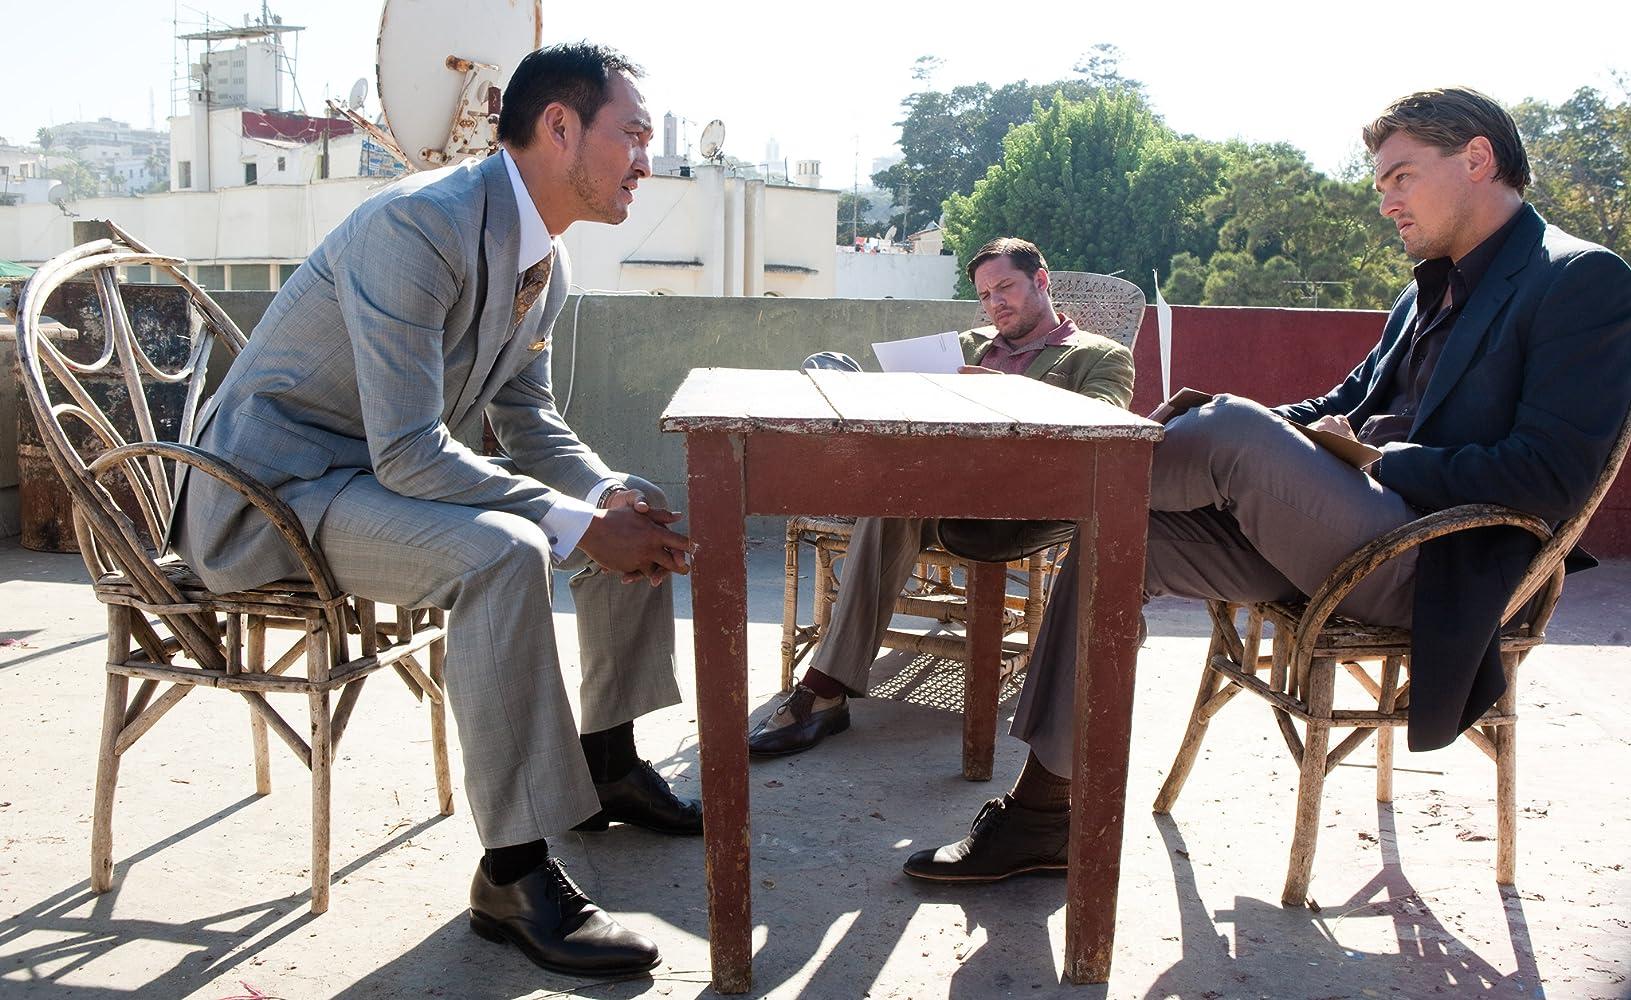 Leonardo DiCaprio, Tom Hardy, and Ken Watanabe in Inception (2010)